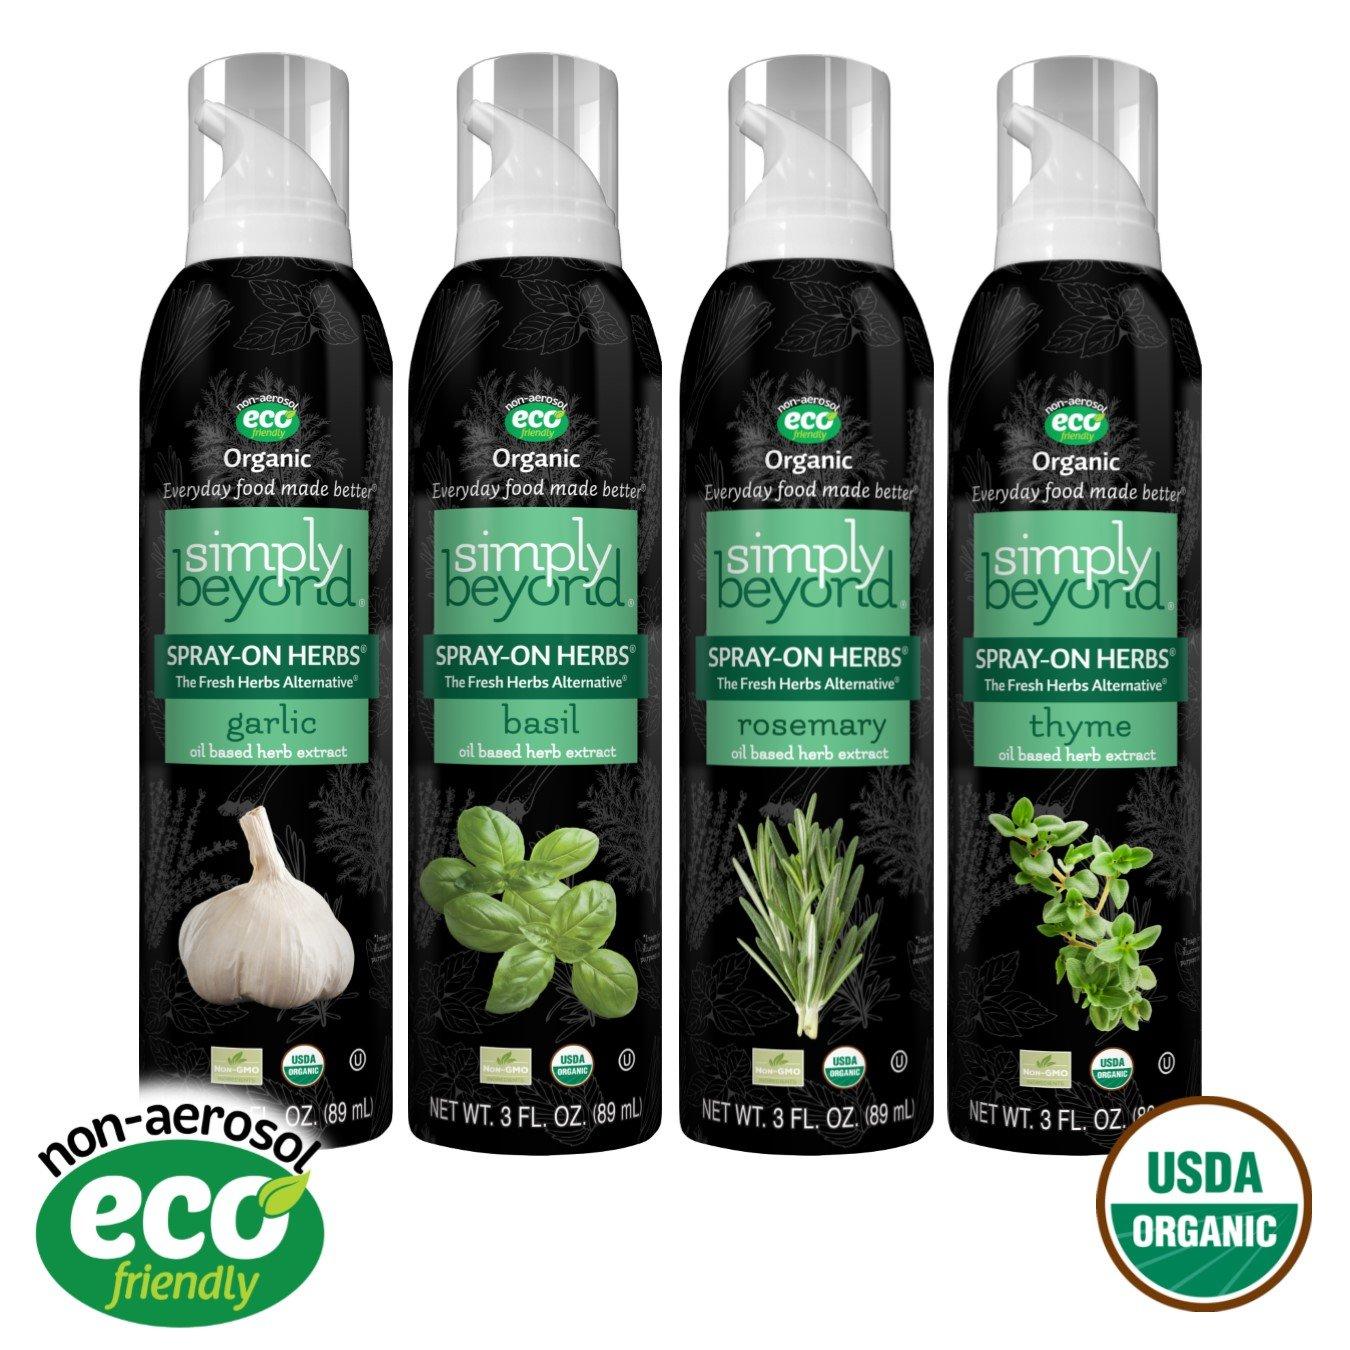 Simply Beyond, Organic Spray-On Herbs 4-Pack (Garlic, Basil, Thyme, Rosemary), 3 Fl. Oz